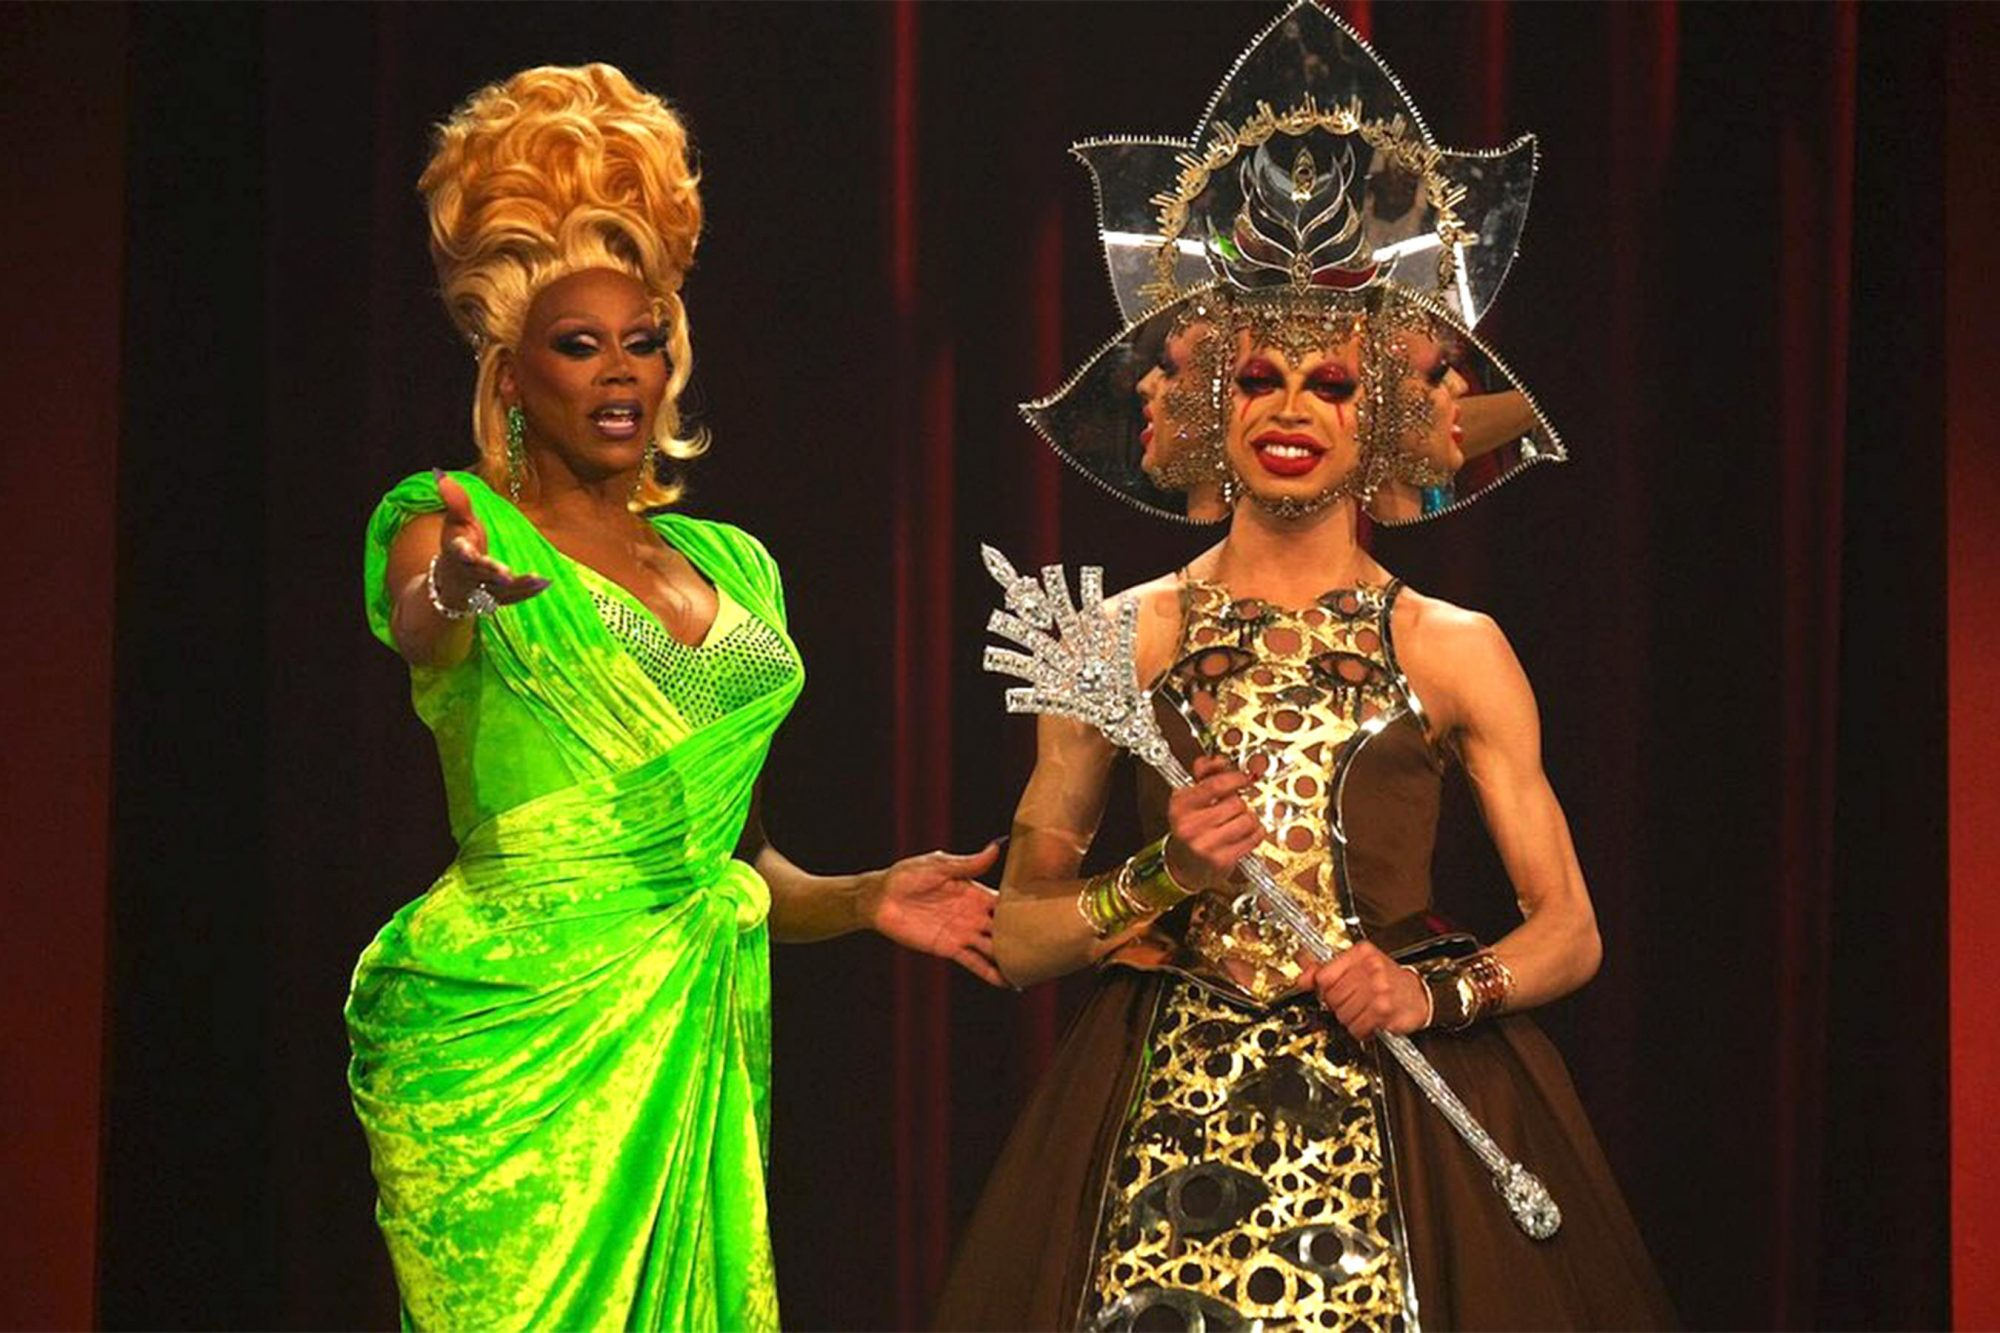 RuPaul's Drag Race Season 11 finale RuPaul and season 11 winner, Yvie Oddly